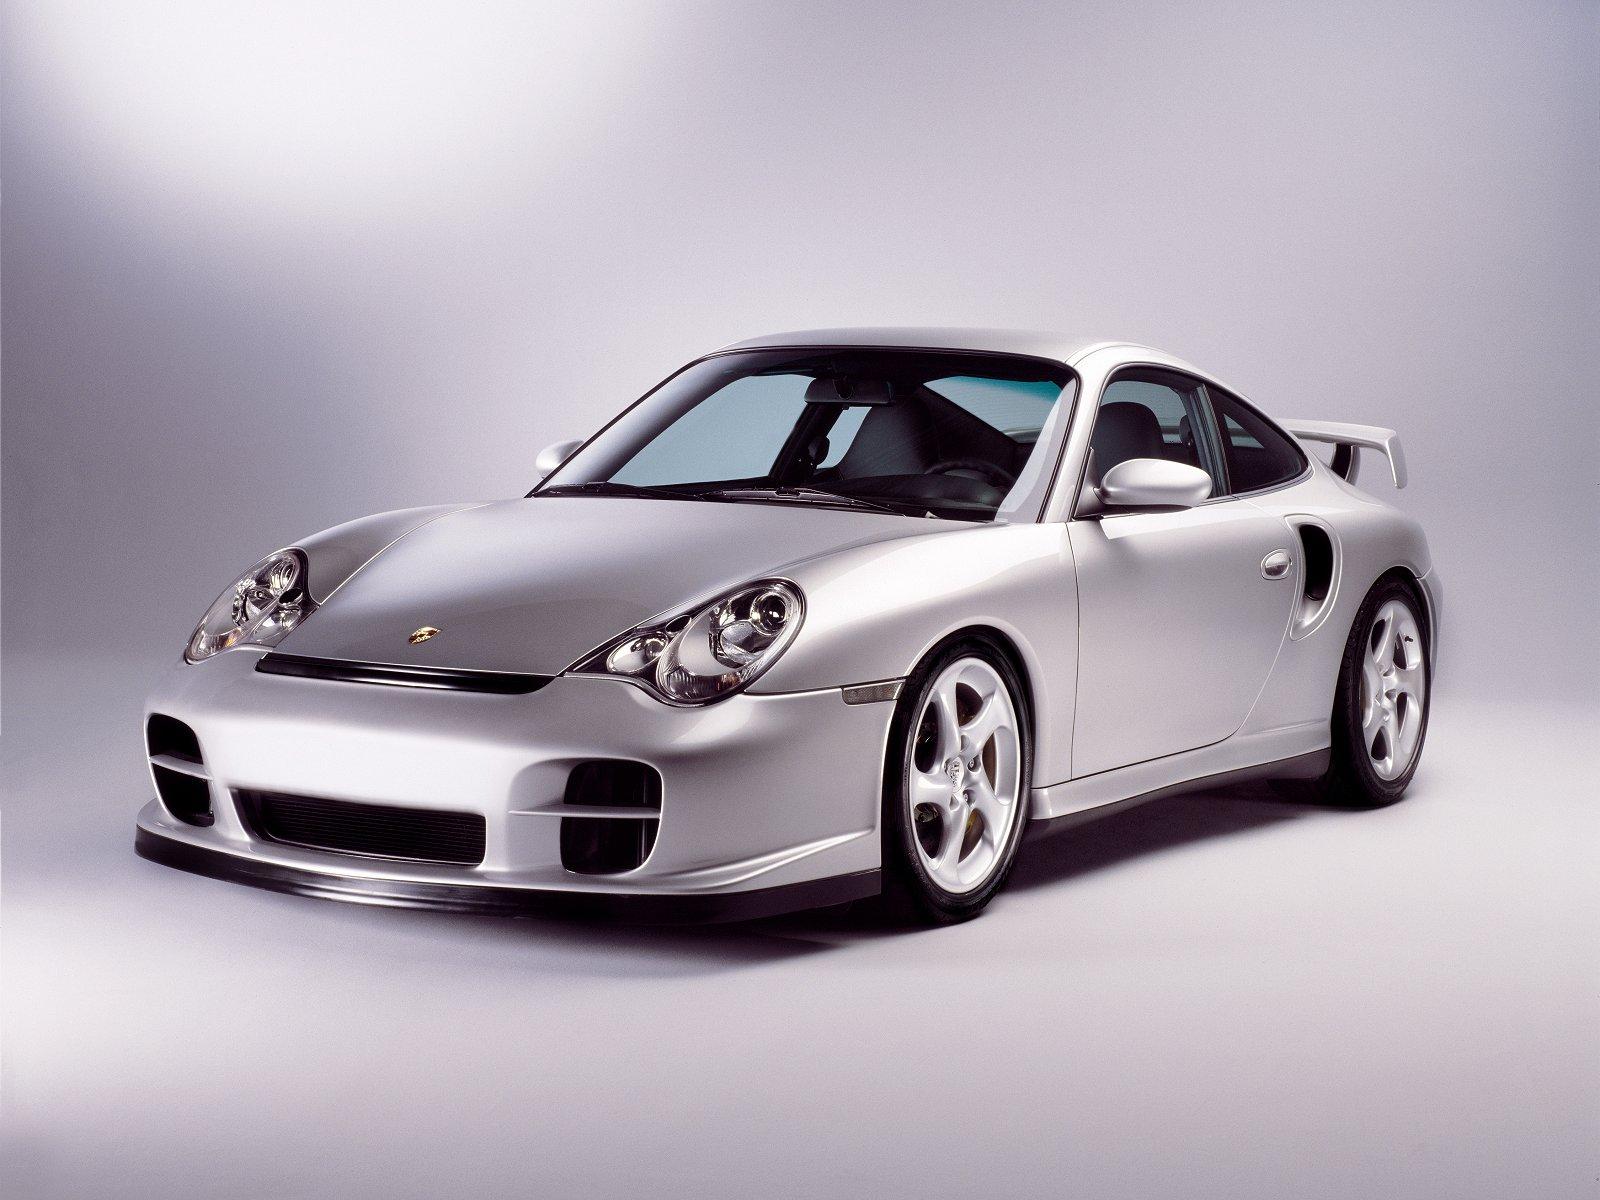 Picture of 2003 Porsche 911